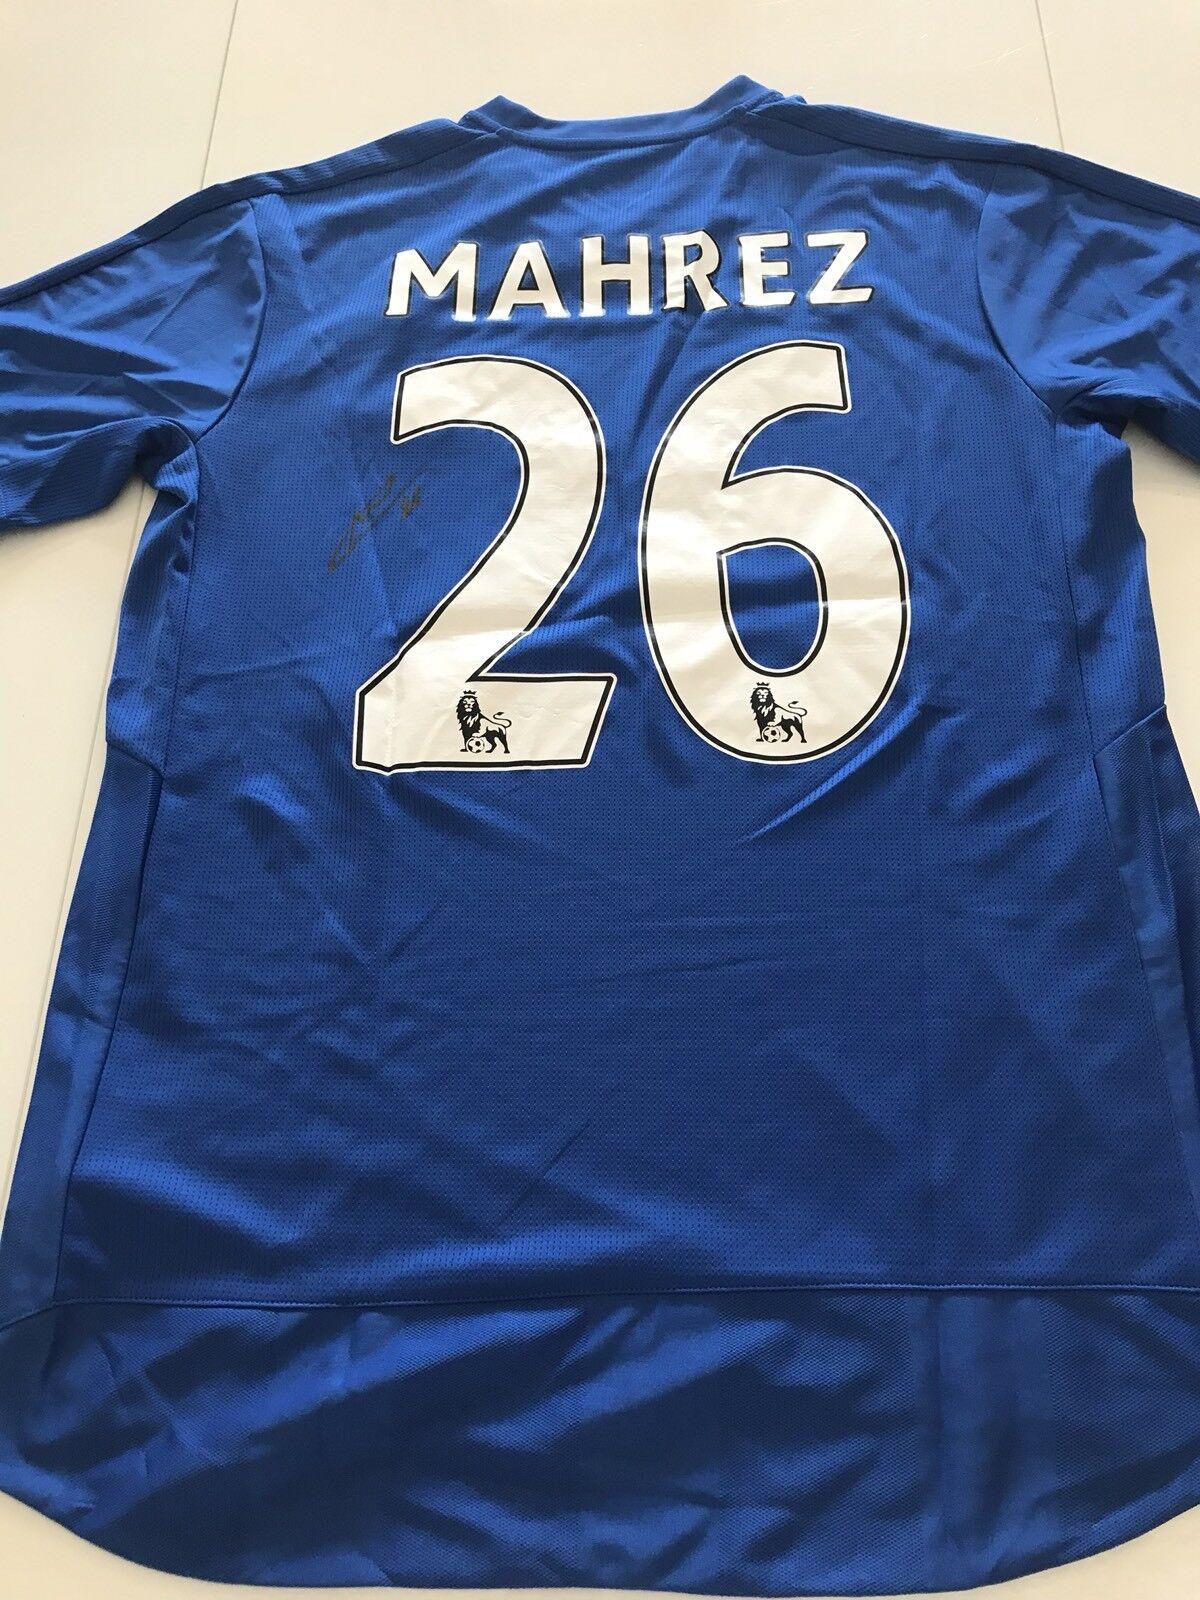 Maillot Football Riyad Marhez Leicester City 2015 16 Signed Signé Vintage COA